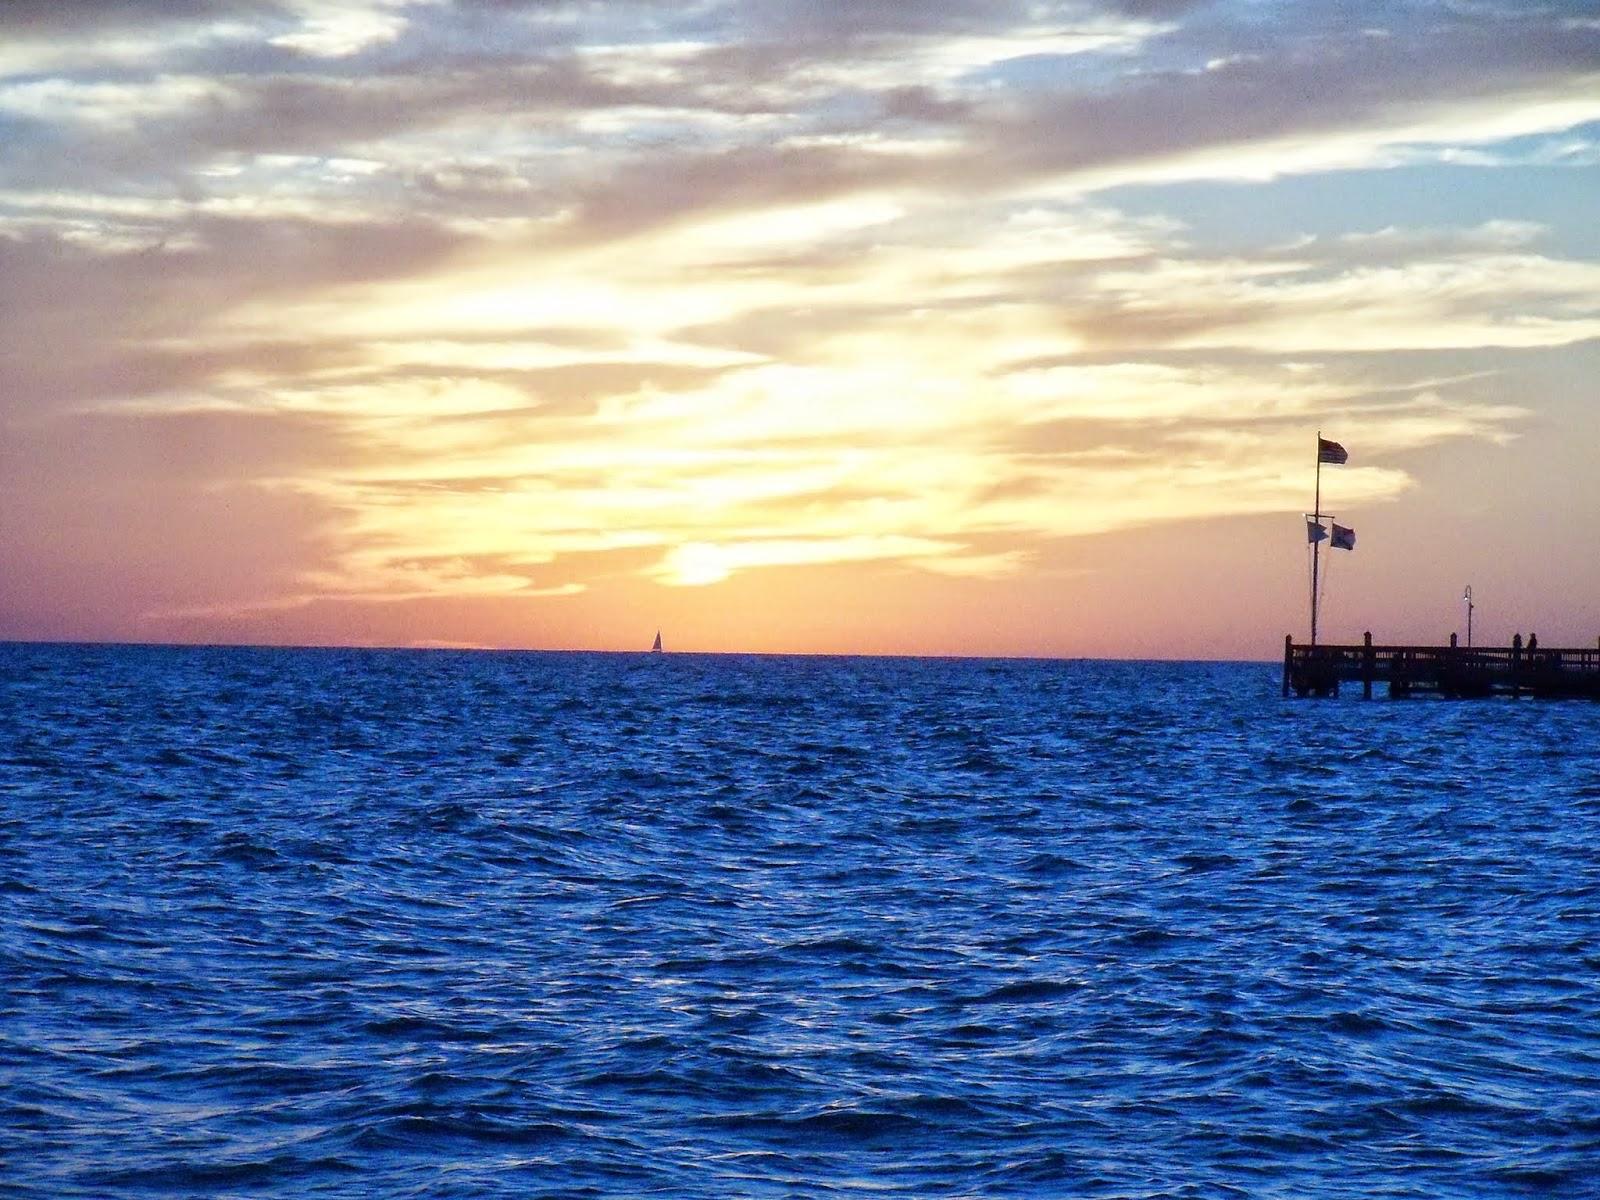 Key West Vacation - 116_5616.JPG